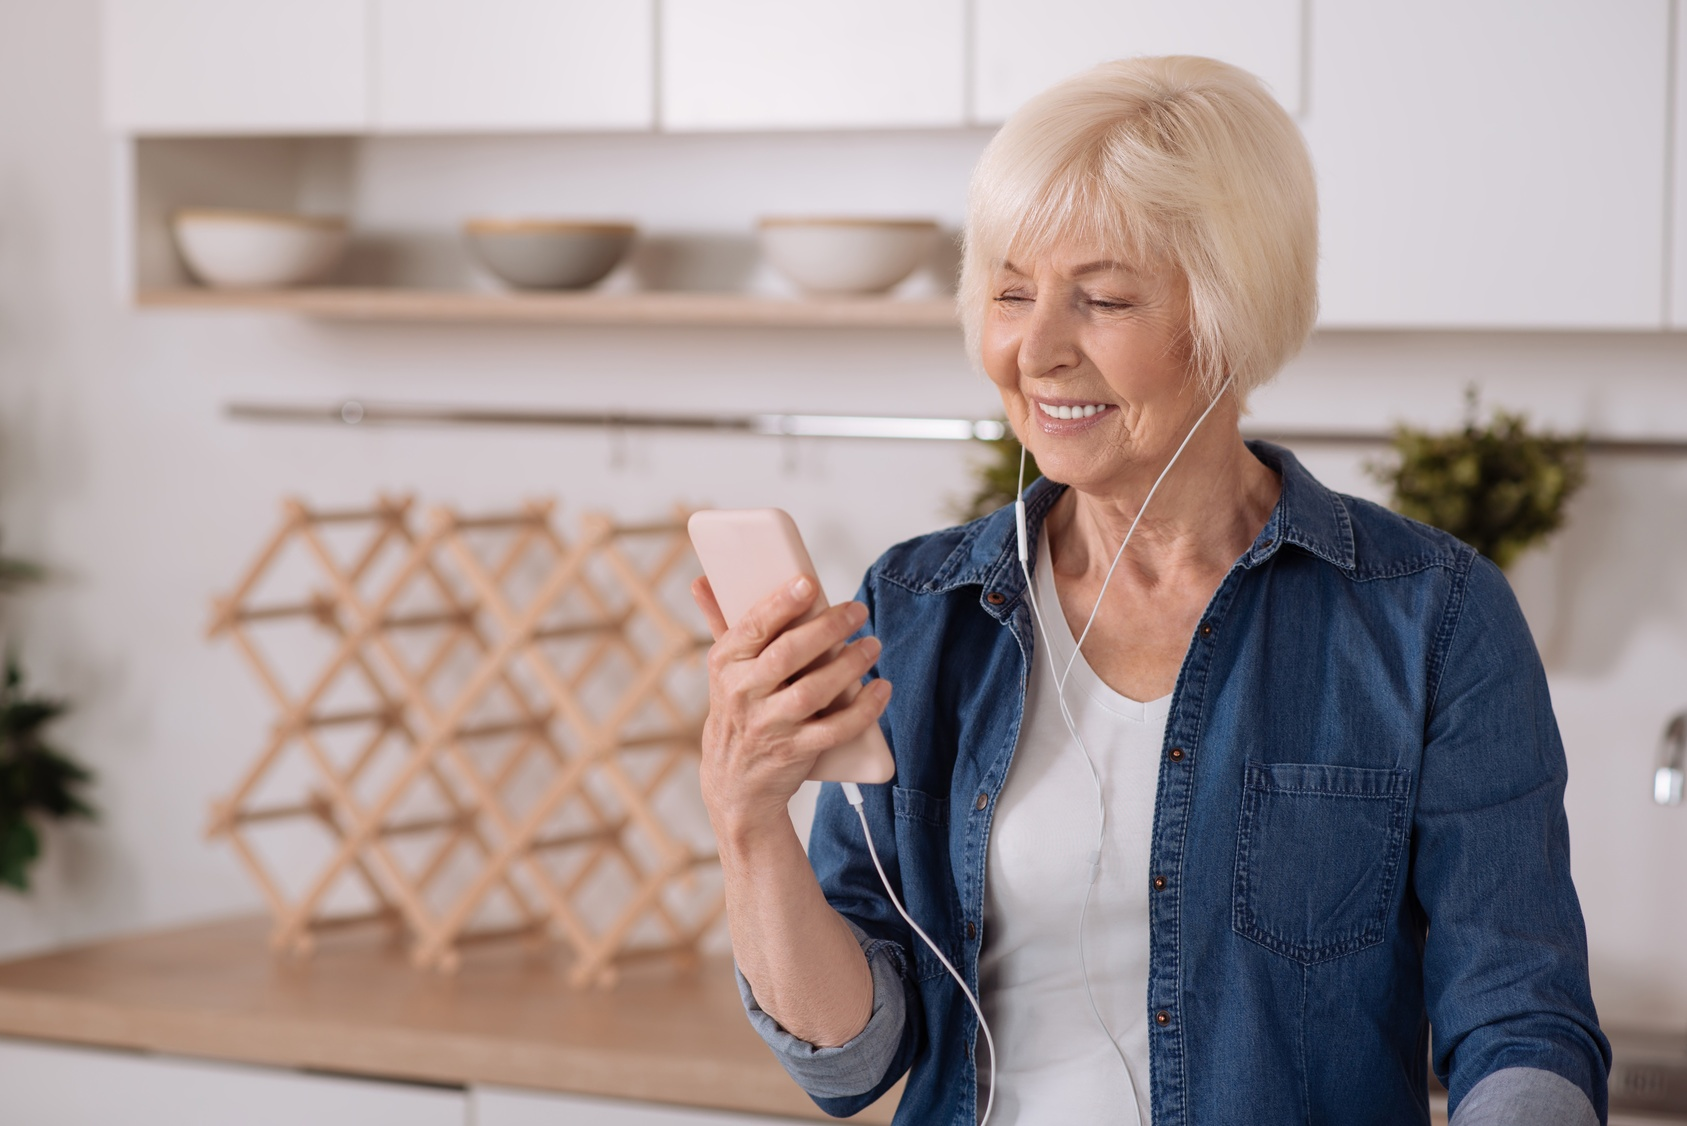 technology-positive-aging.jpg